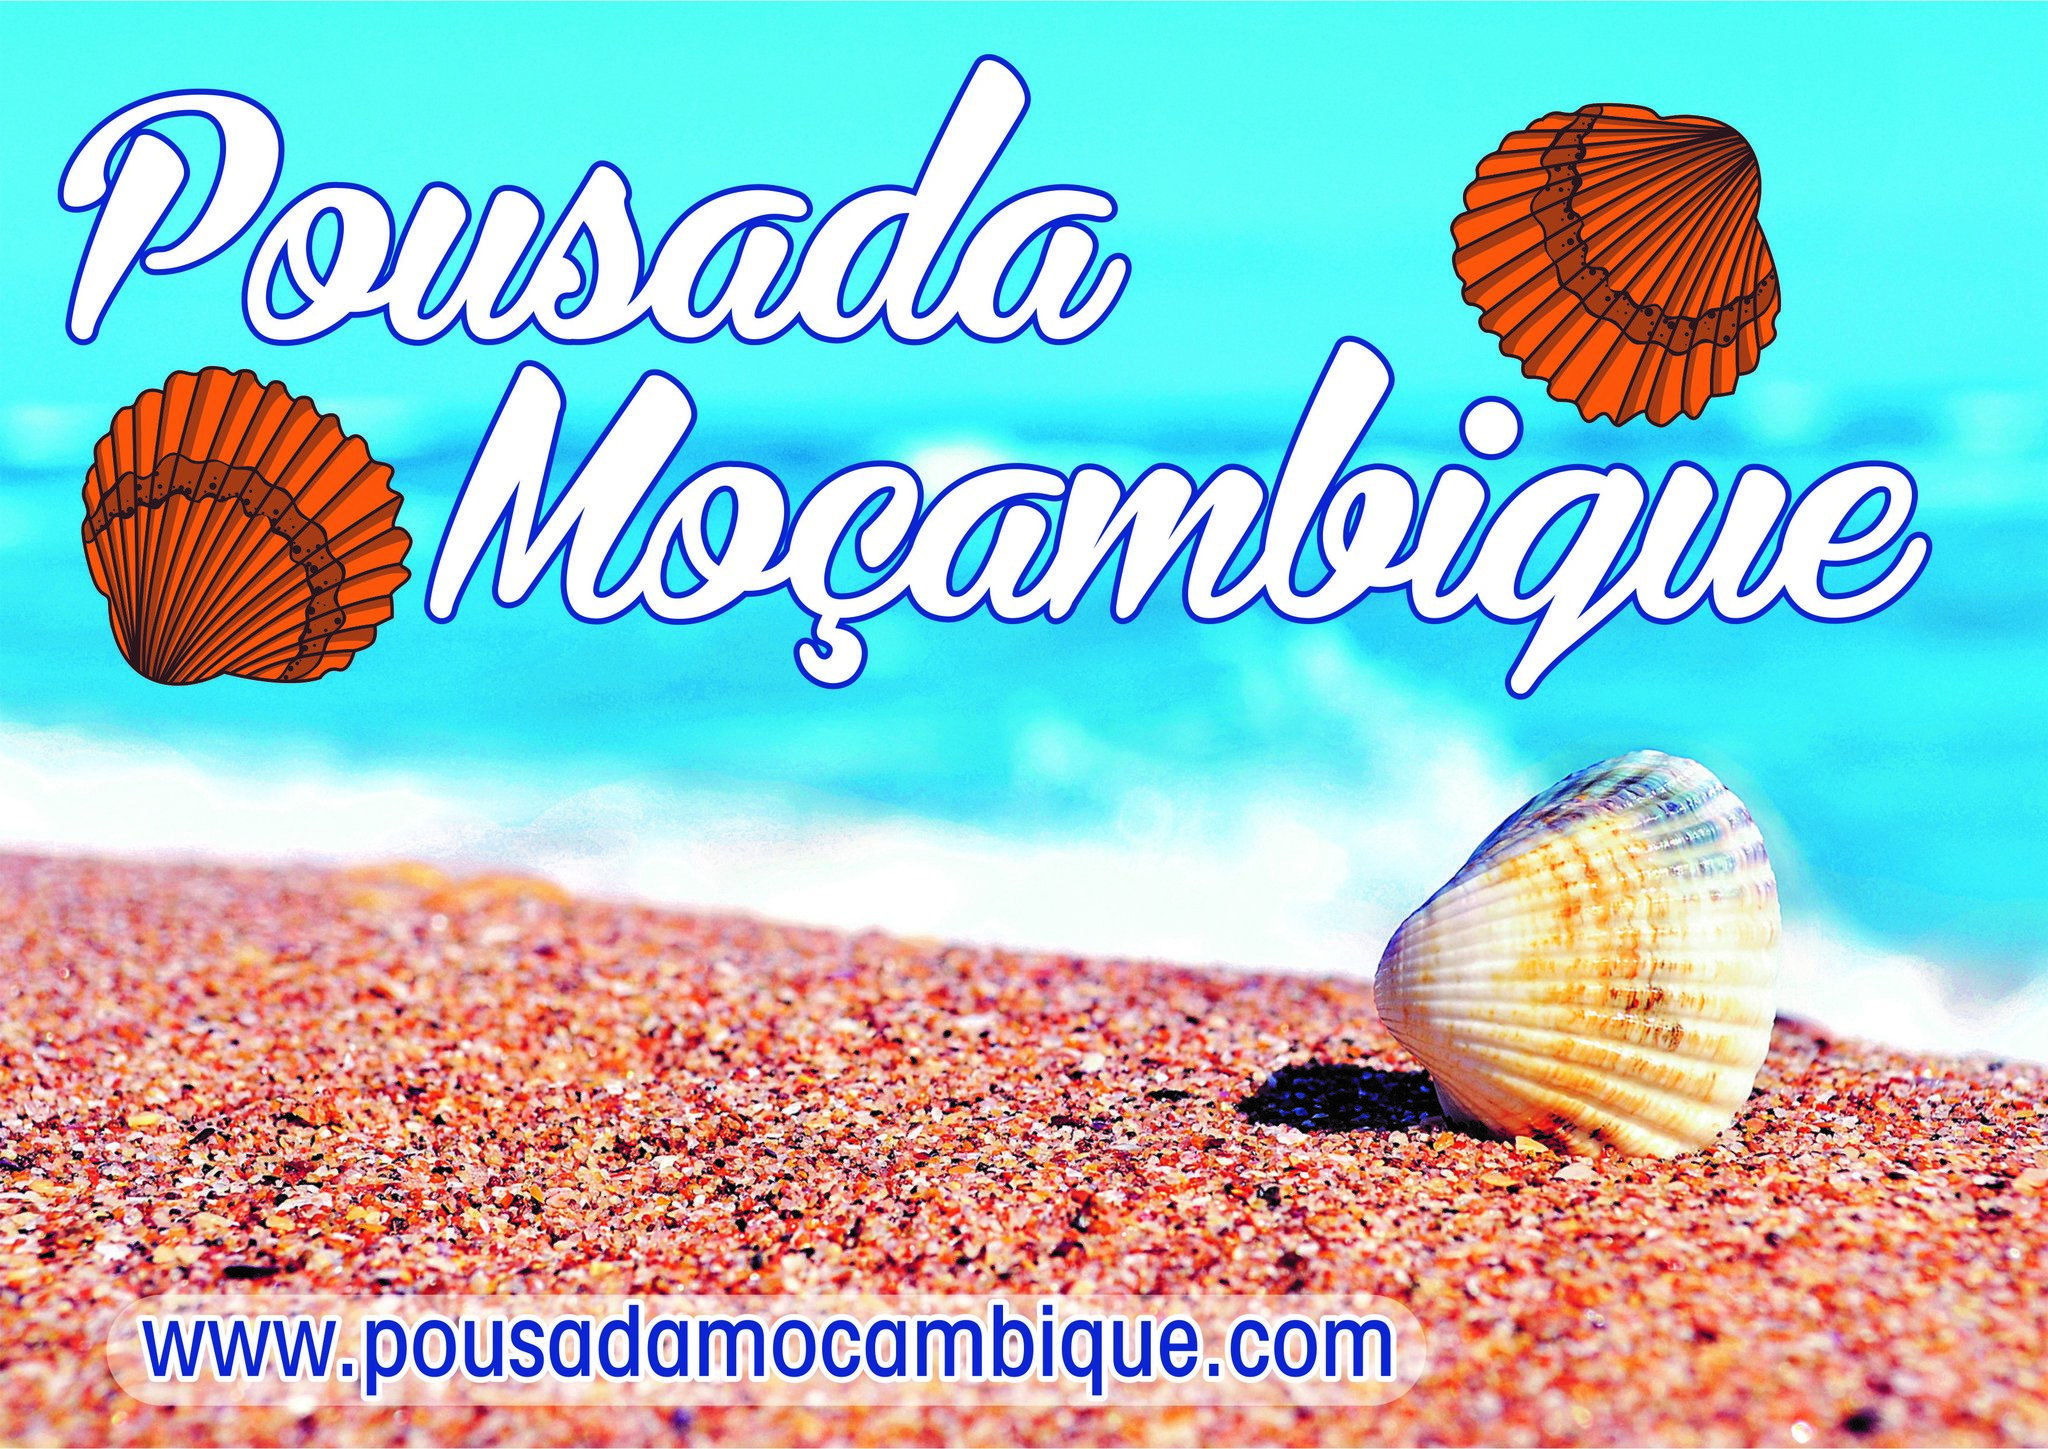 Pousada Moçambique